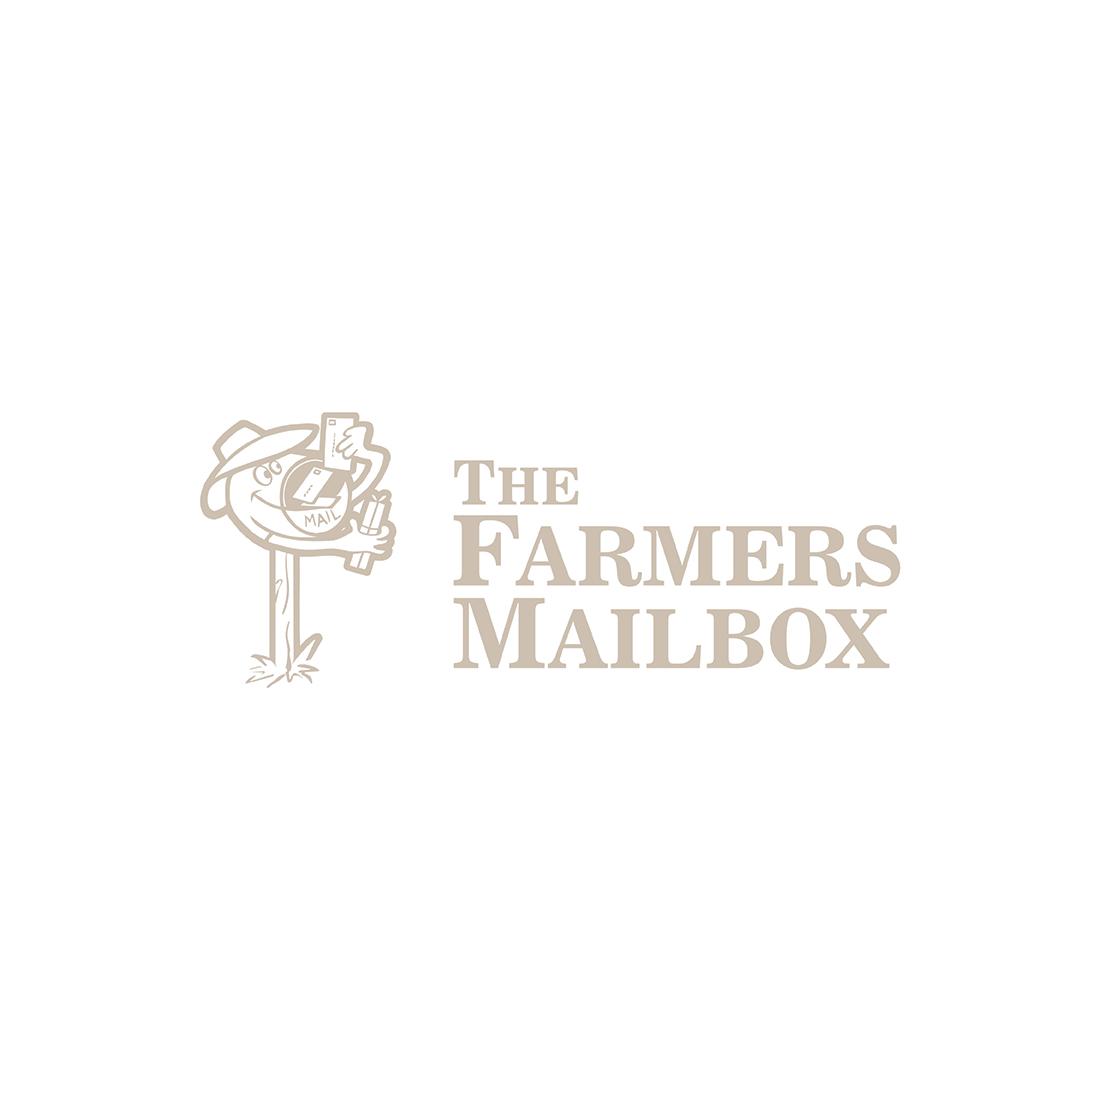 Gaun Rollaway Triple Nesting Box